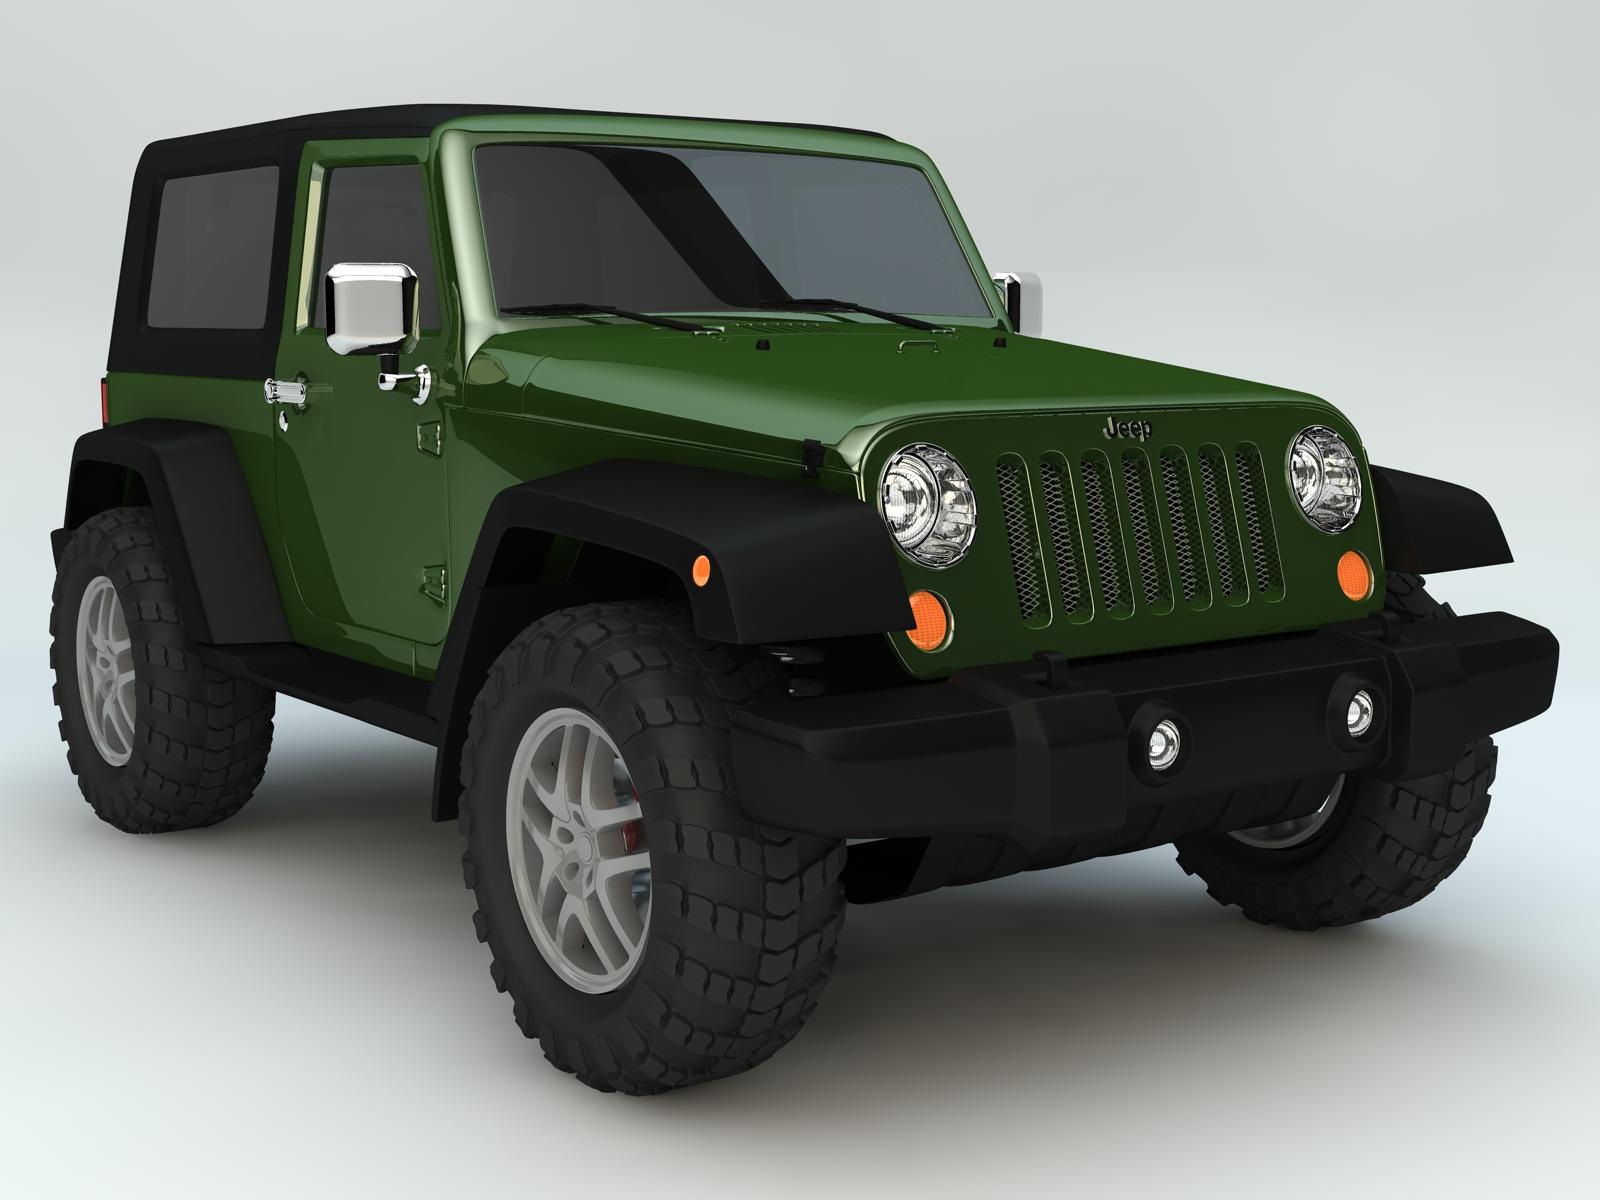 jeep wrangler rubicon 2007 3d model buy jeep wrangler. Black Bedroom Furniture Sets. Home Design Ideas